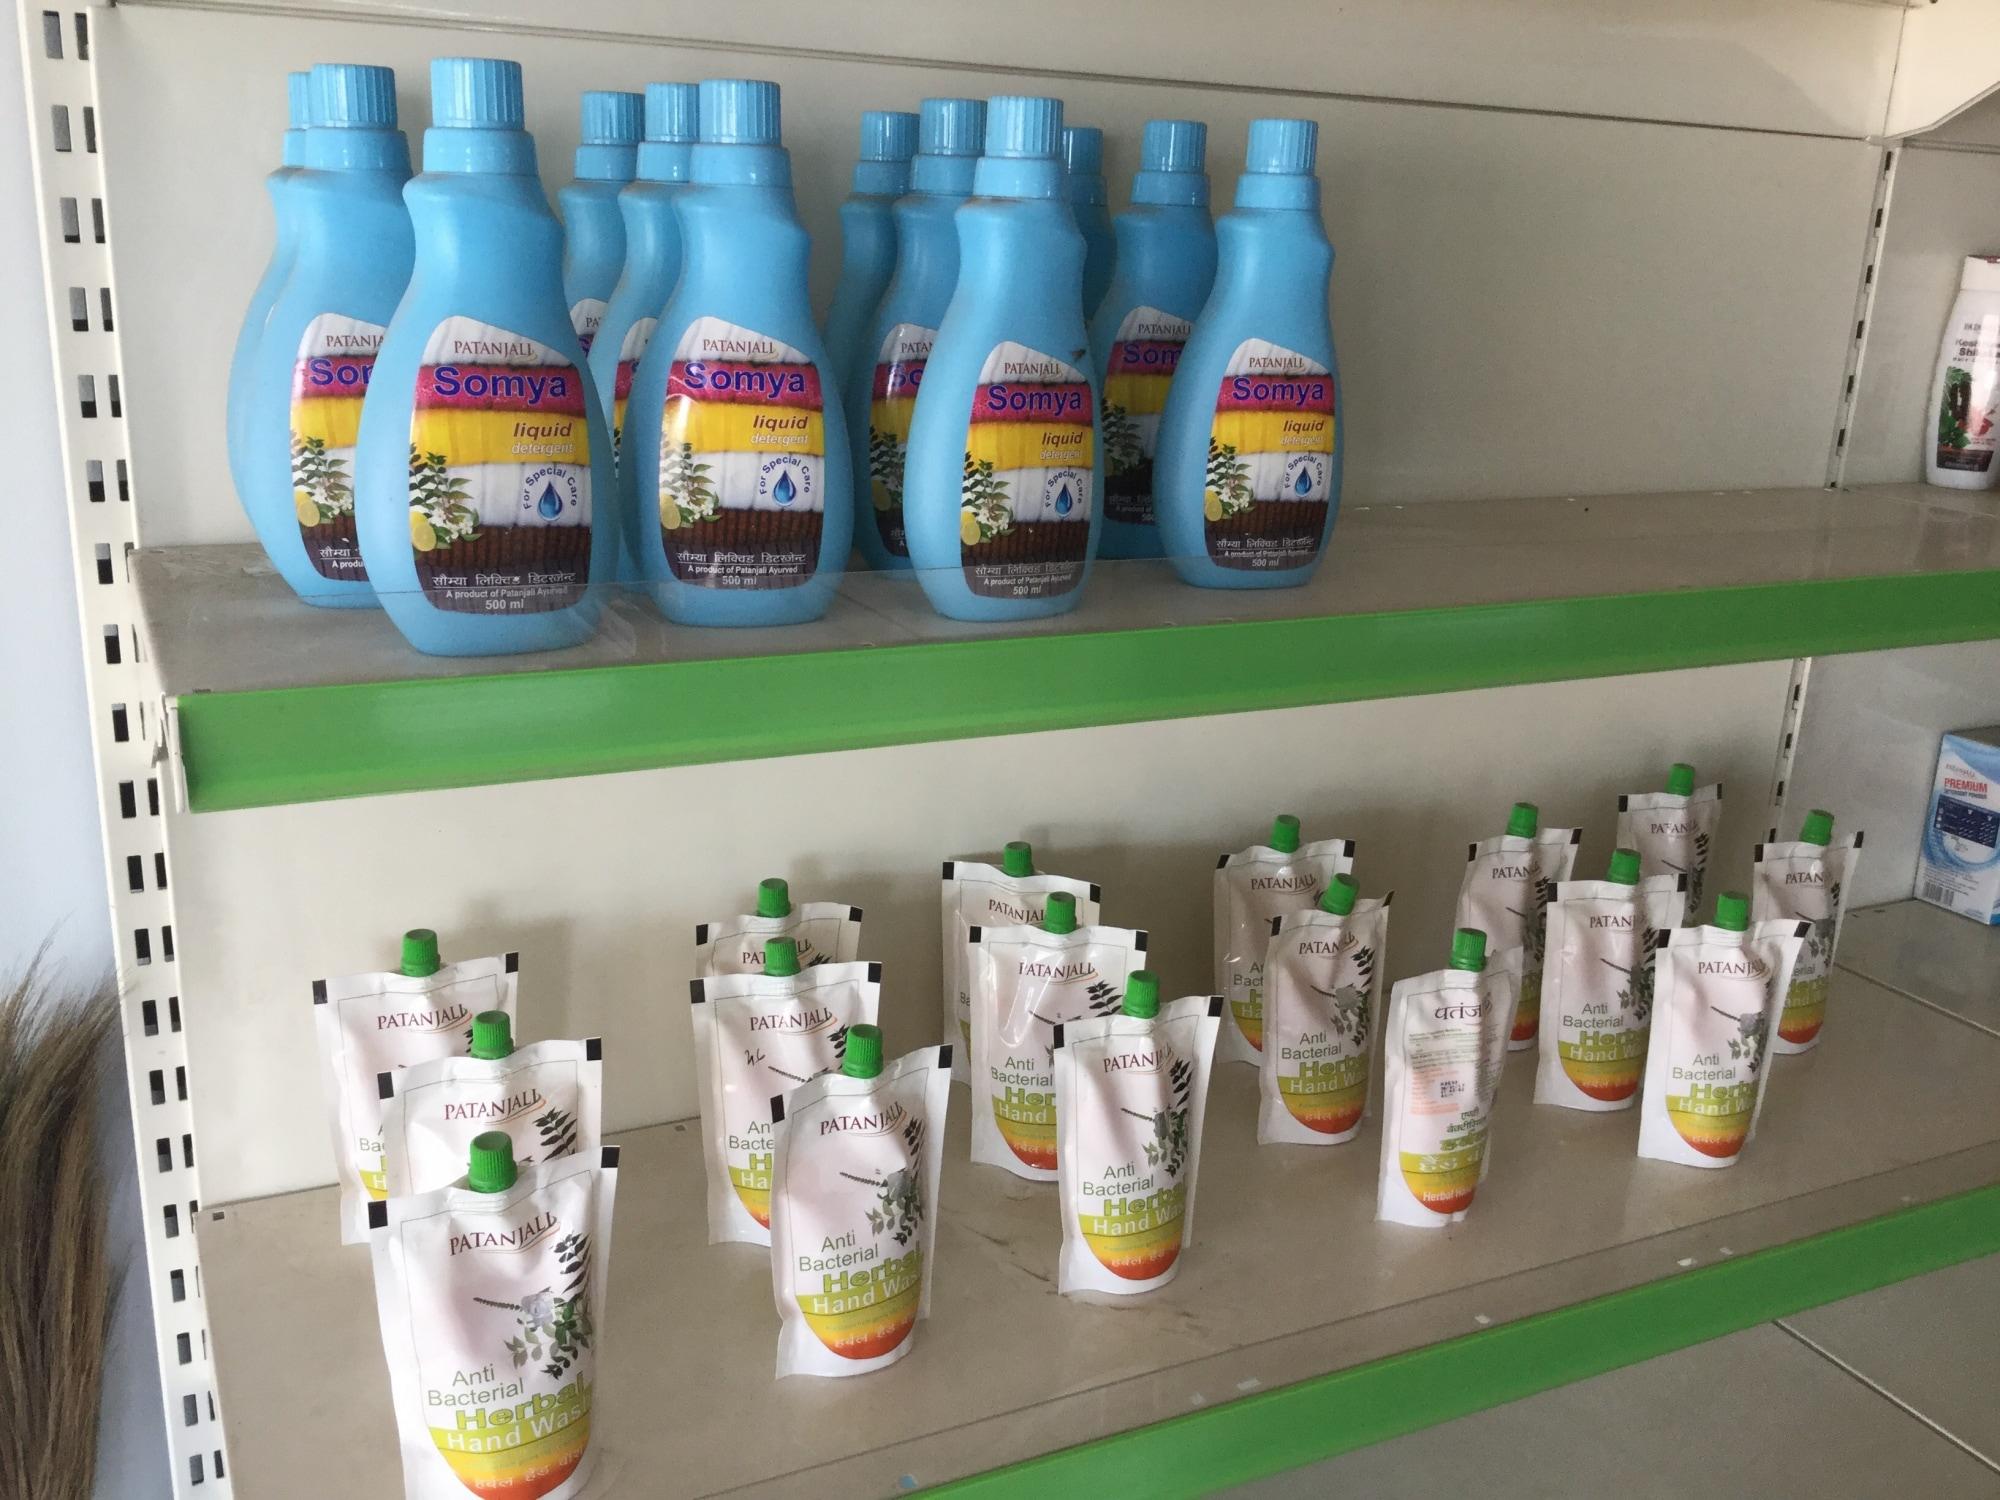 Top 10 Patanjali Ayurvedic Medicine Retailers For Leucoderma